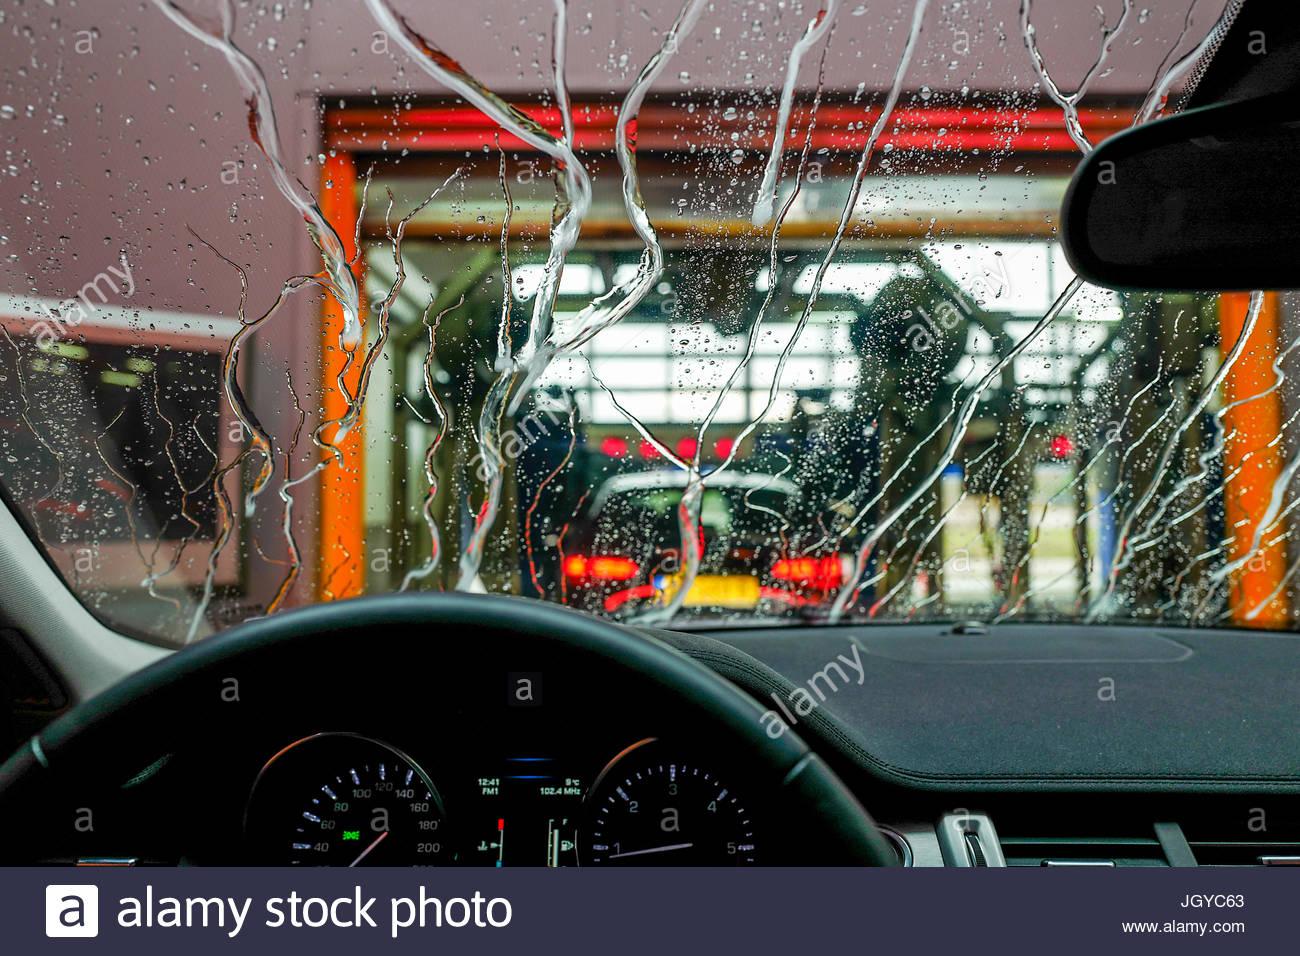 Carwash through a window Stock Photo